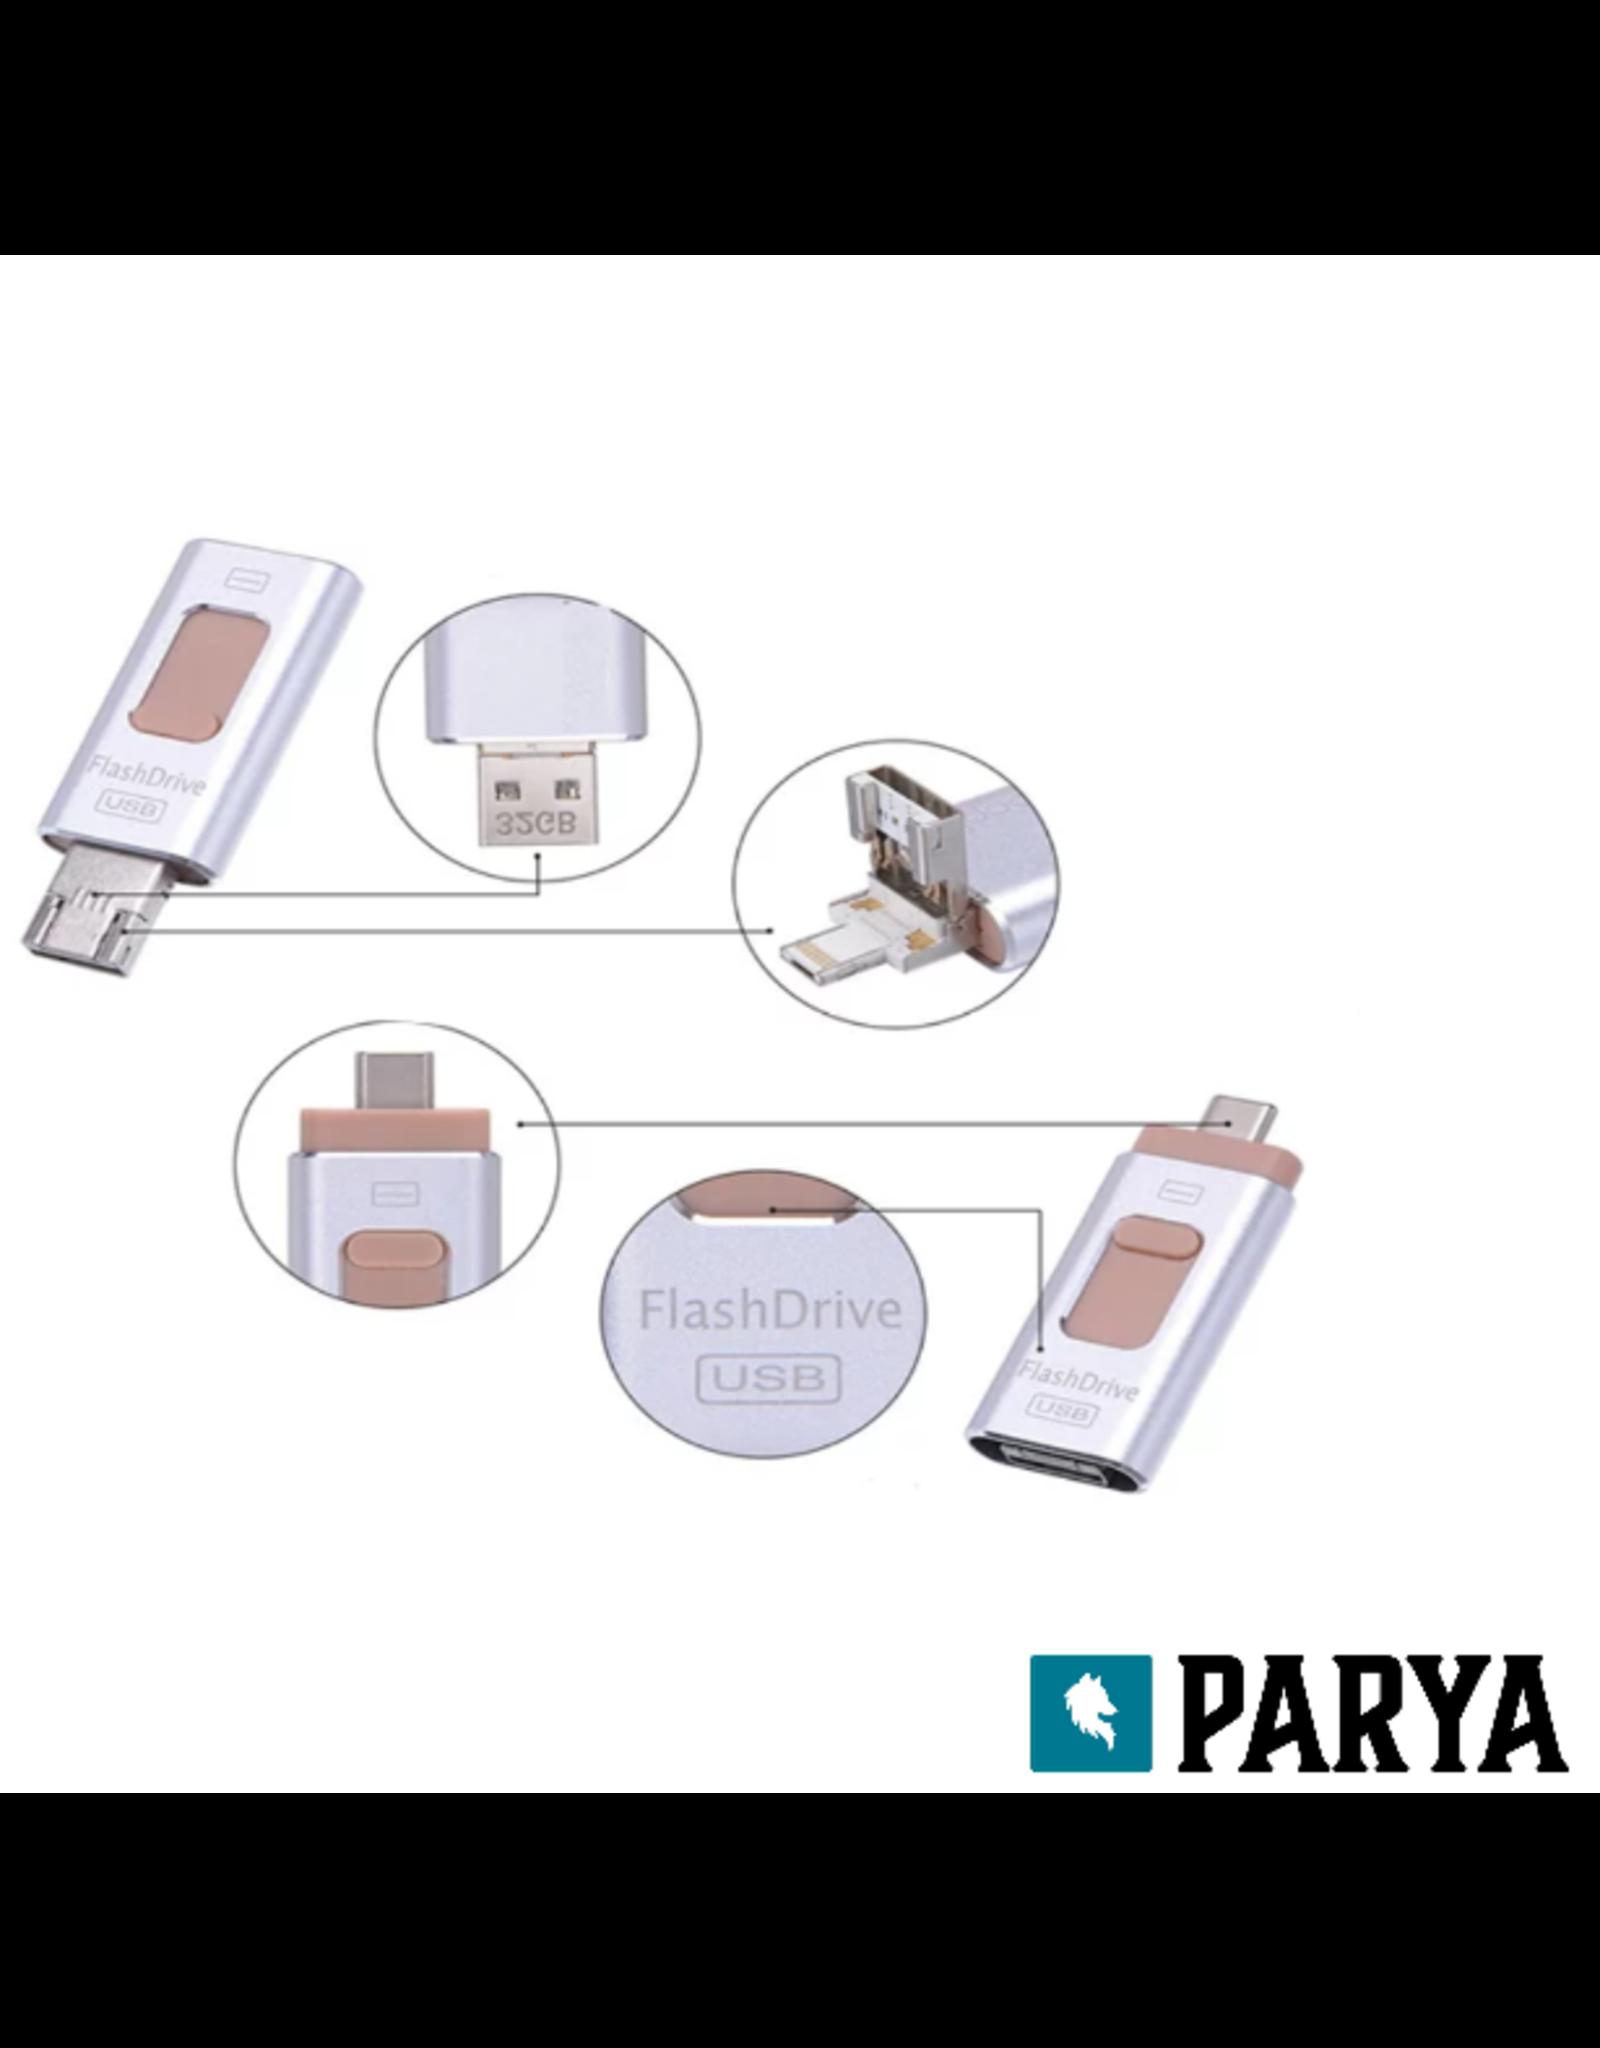 Parya Official Parya 4-in-1 flashdrive